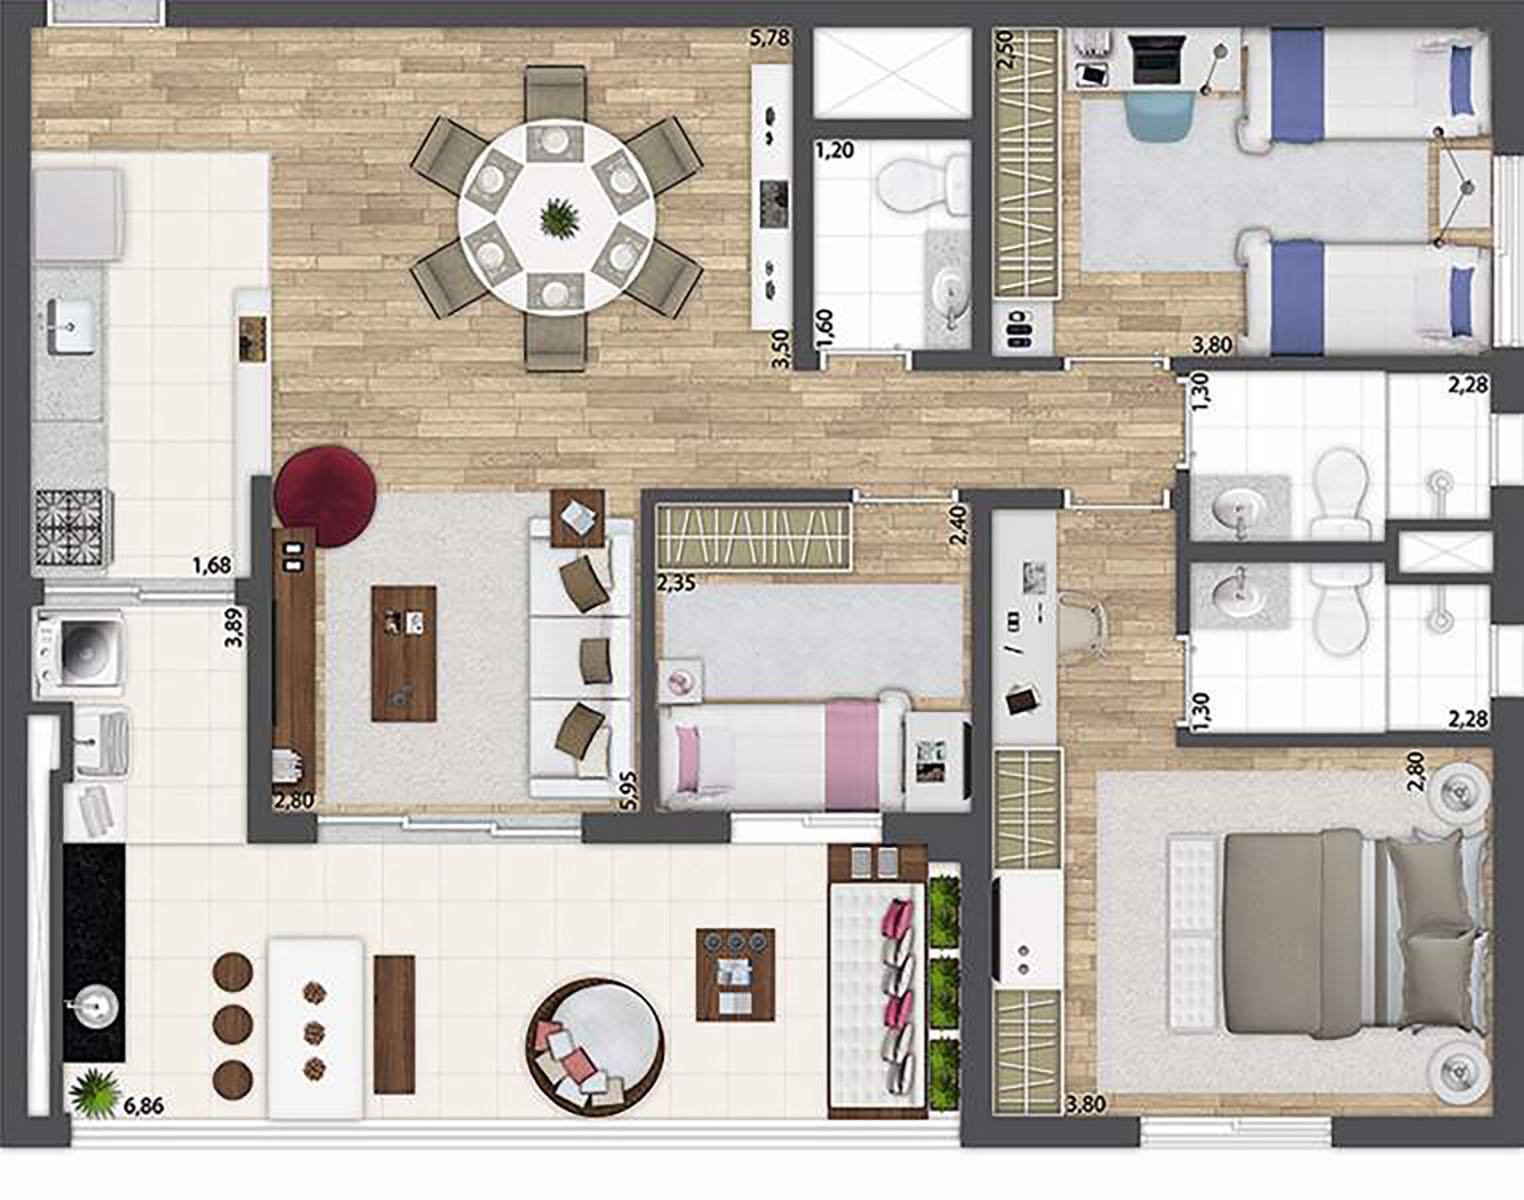 96 m² - 3 dormitórios  O2 Jardim Sul